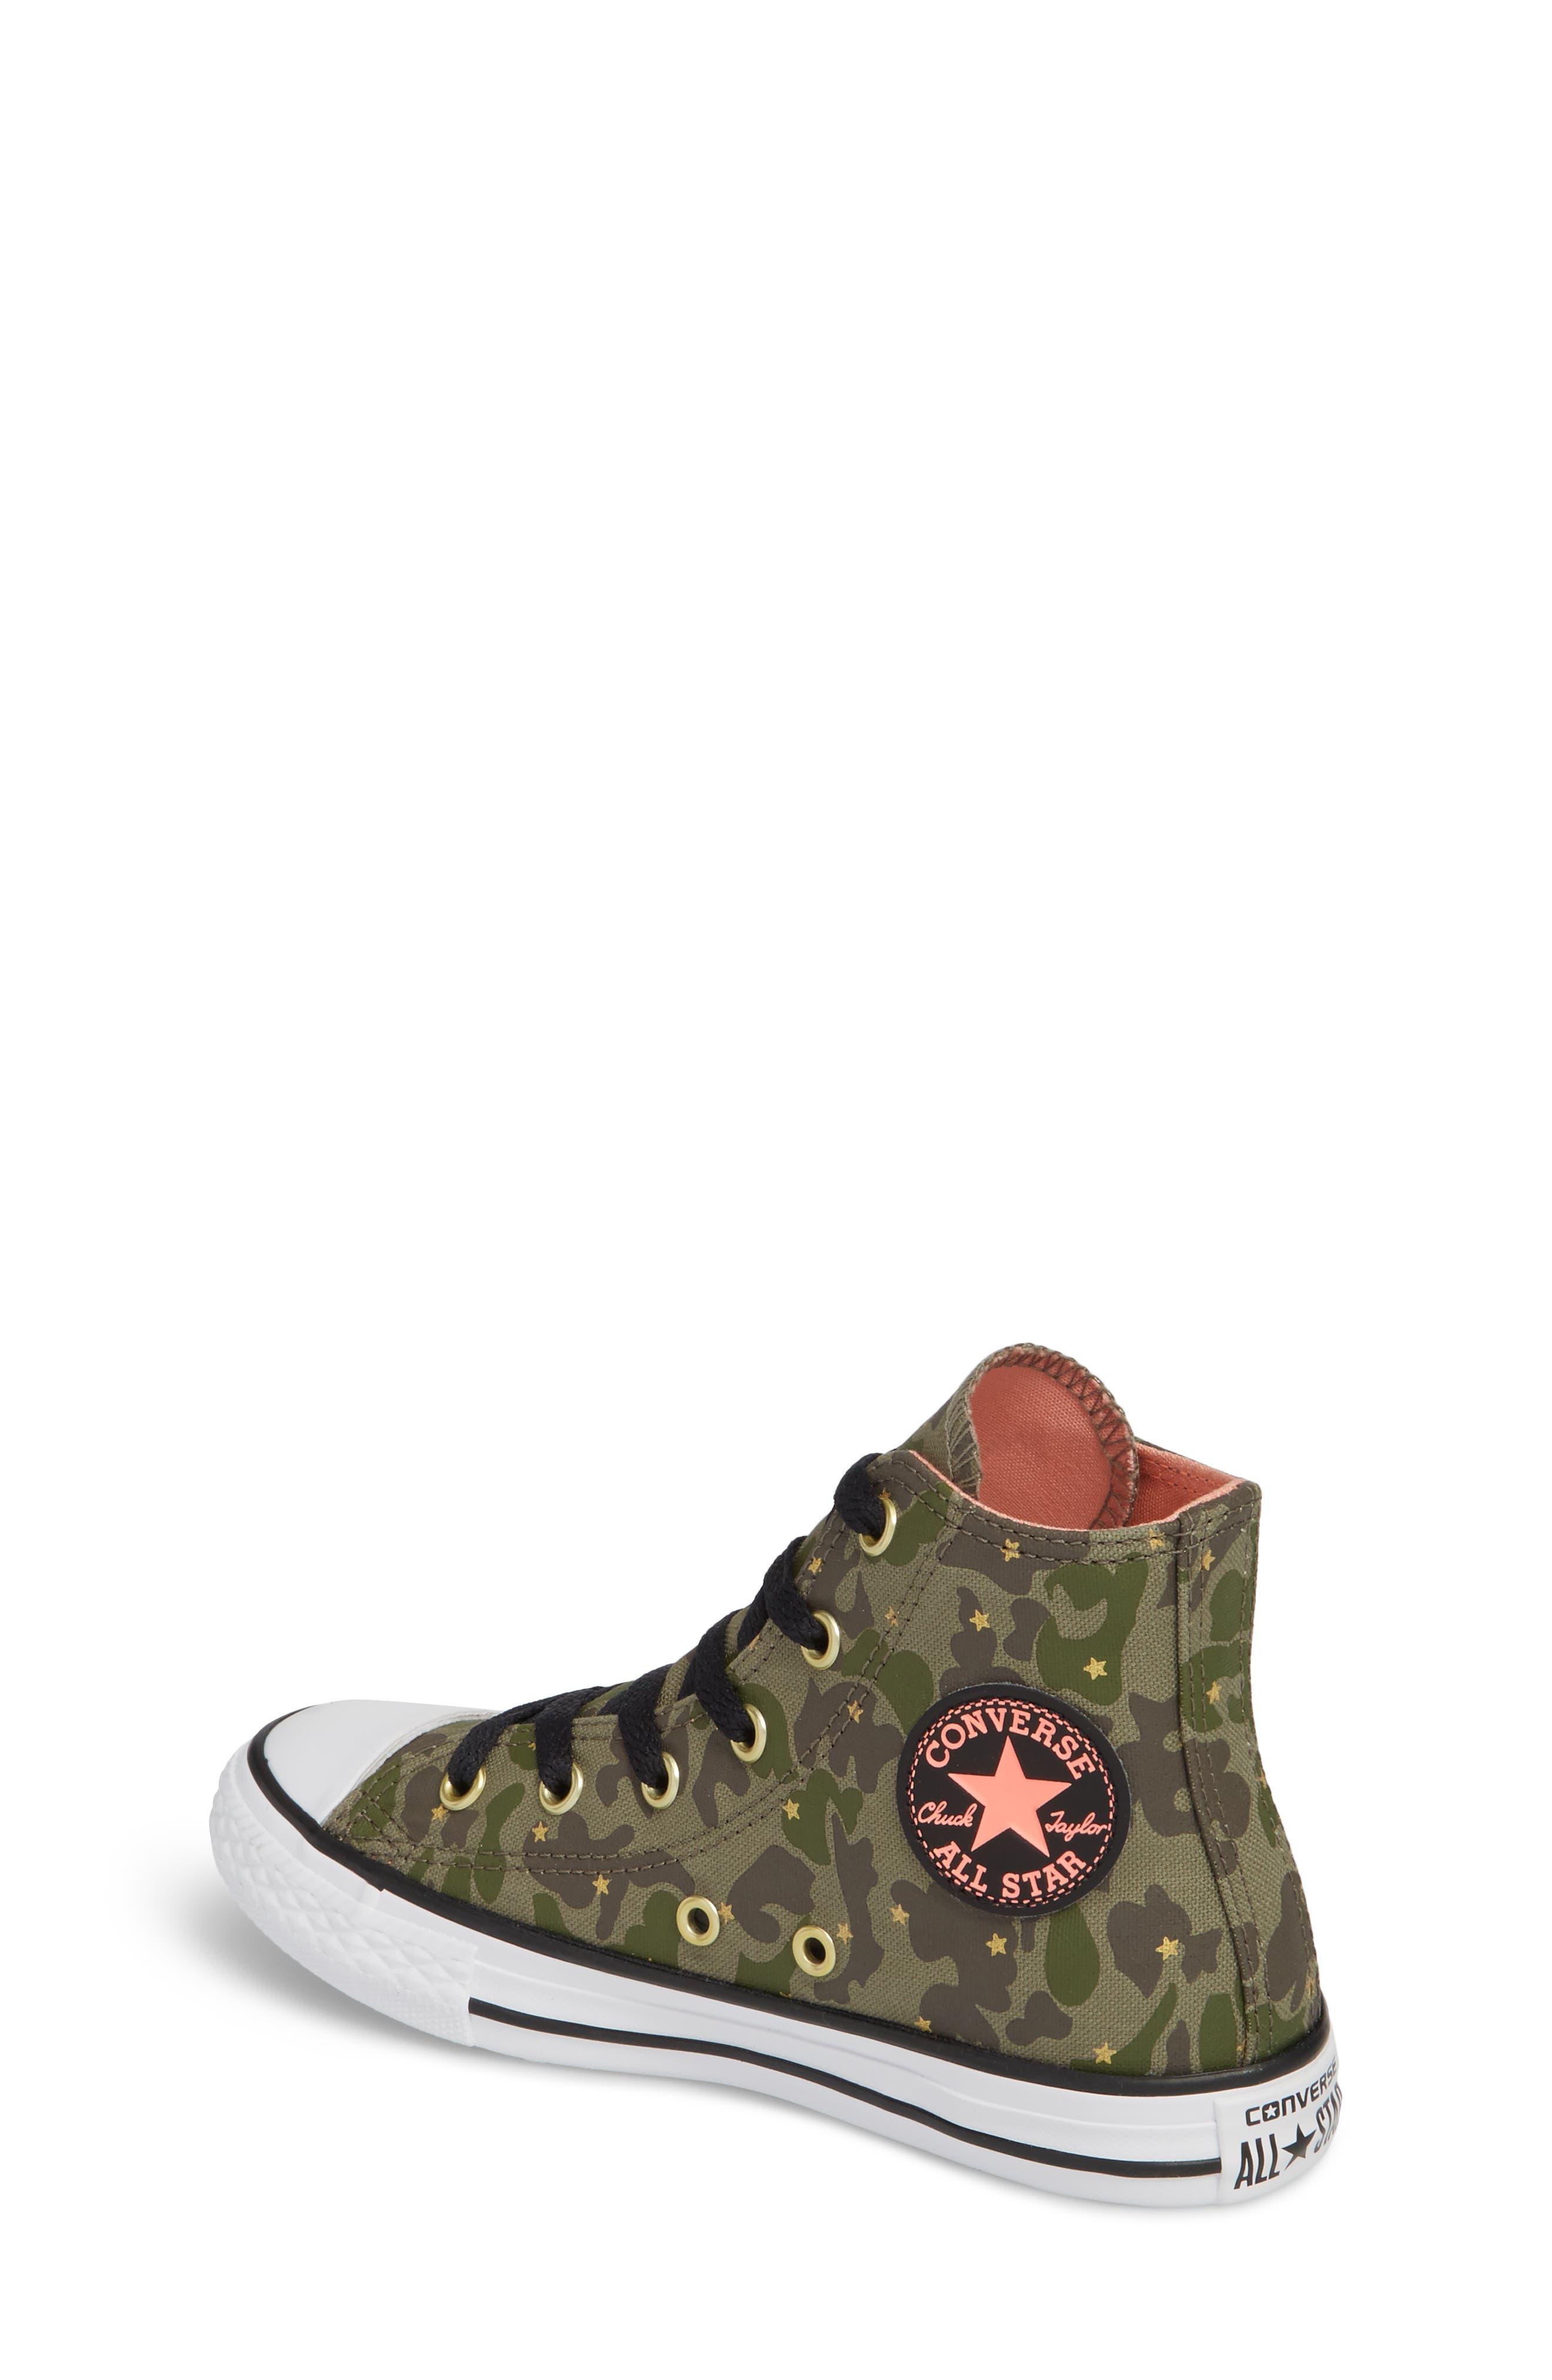 Camo High Top Sneaker,                             Alternate thumbnail 2, color,                             Surplus